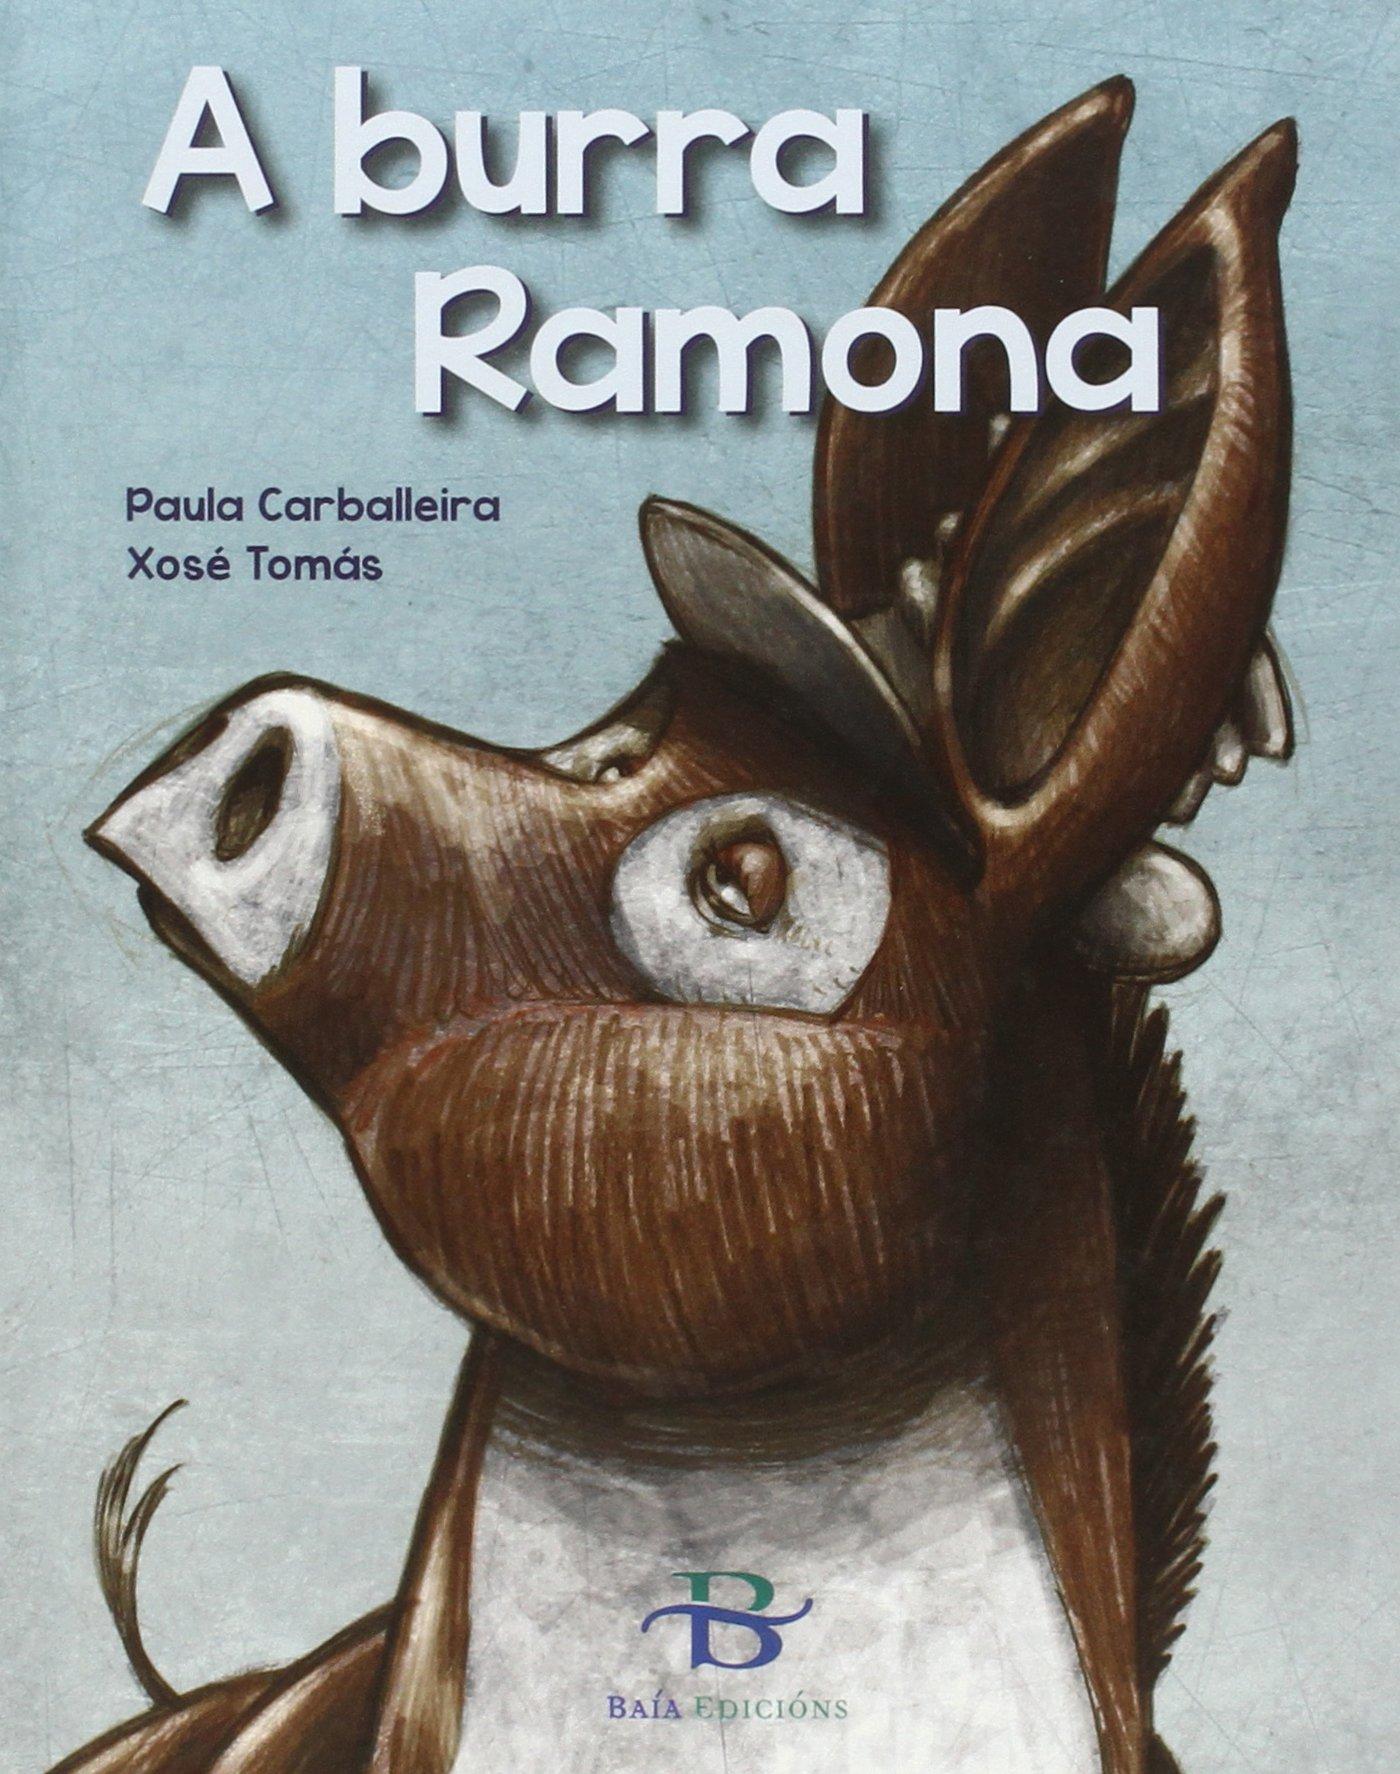 A burra Ramona (infantil-xuvenil) - 9788499950808: Amazon.es: Carballeira, Paula, Tomás, Xosé: Libros